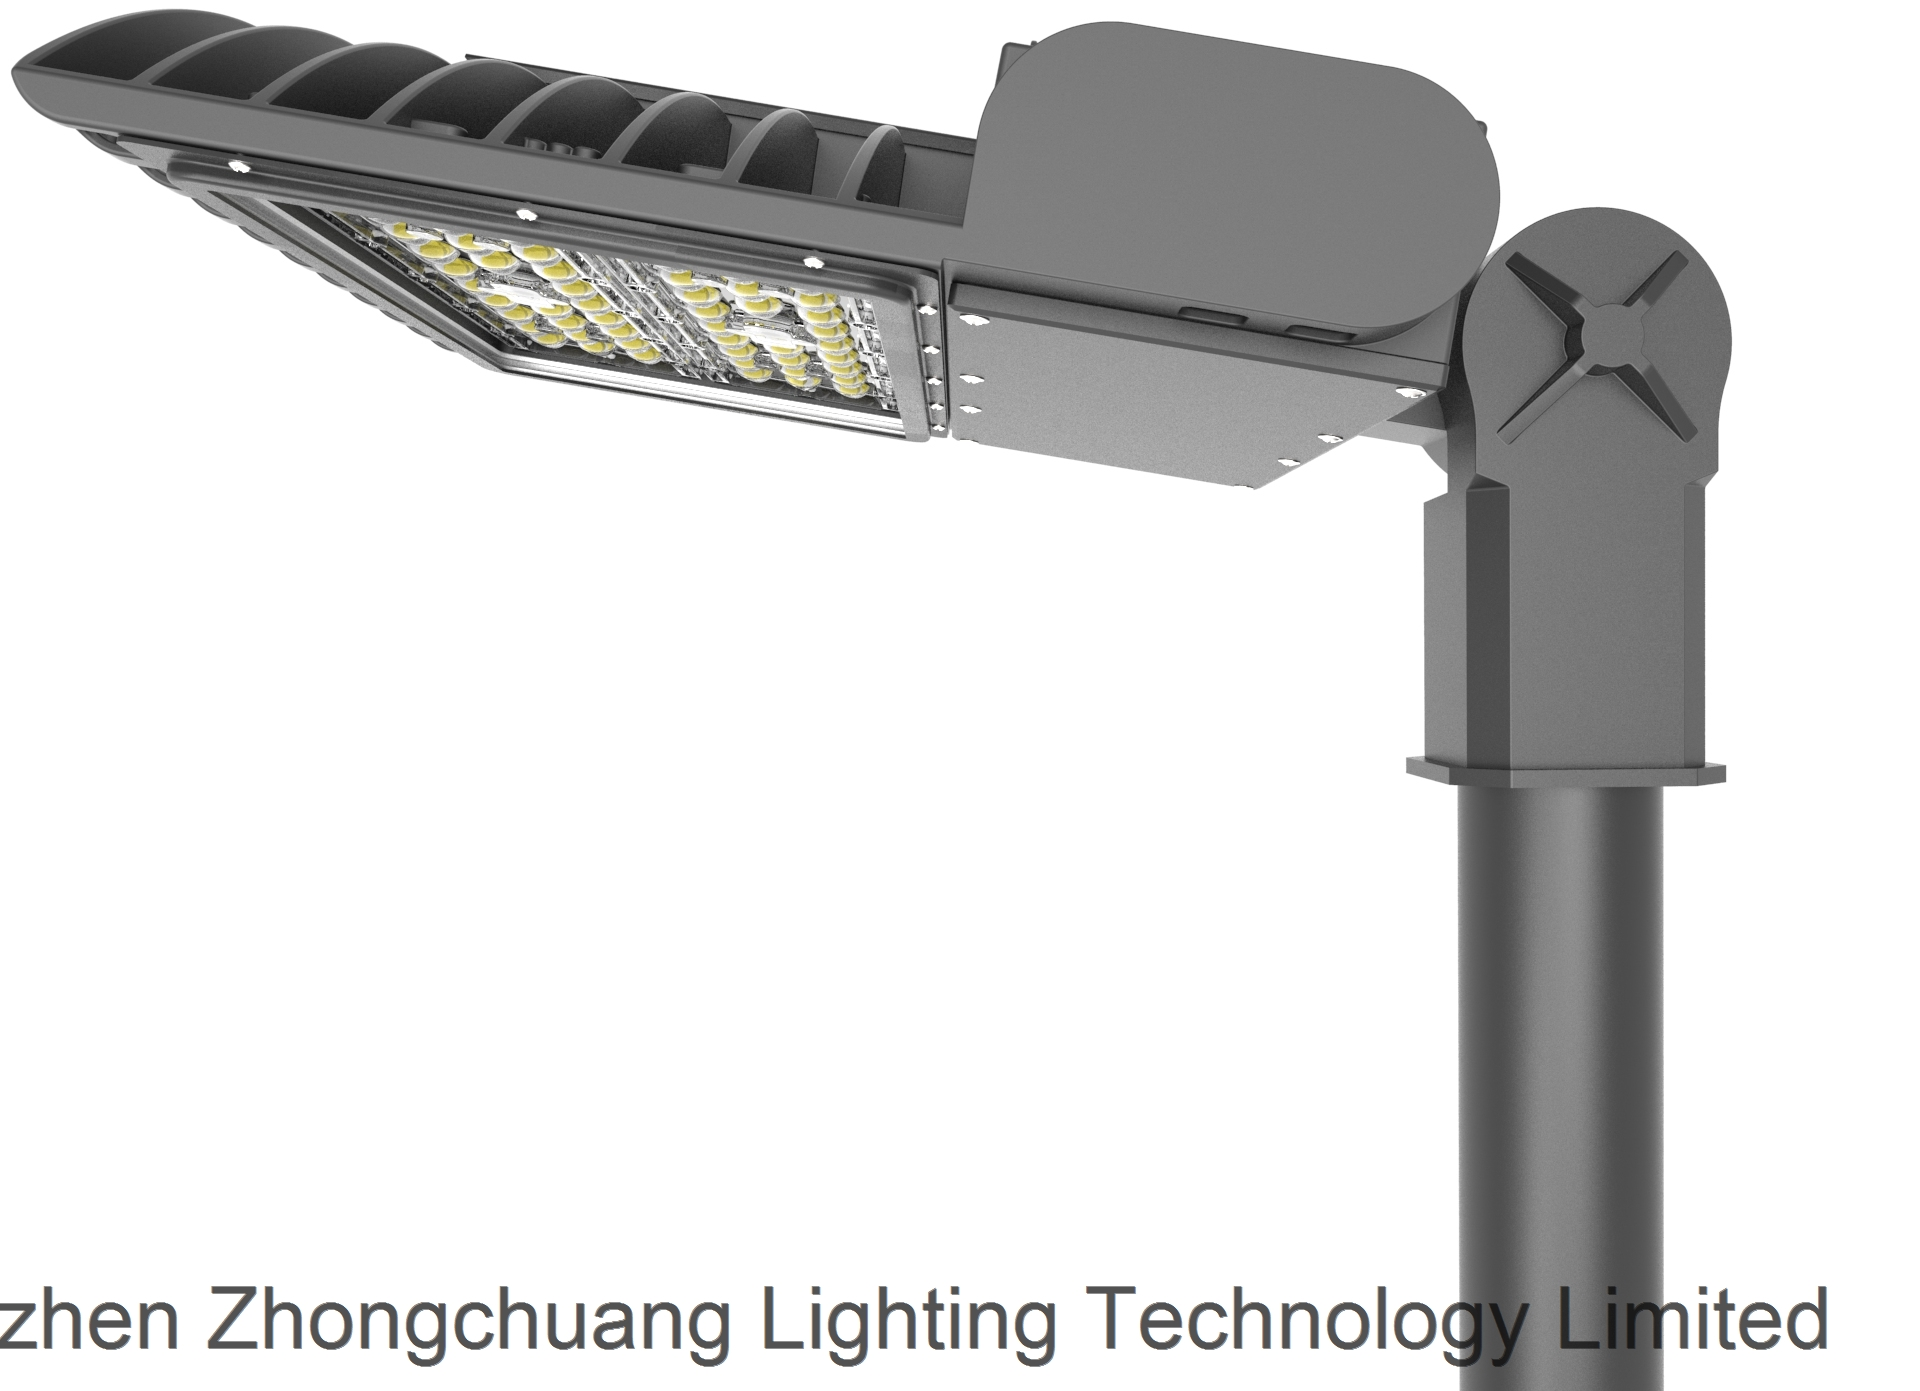 130lm w LED Area Light Sosen driver + Lumileds 3030 LED